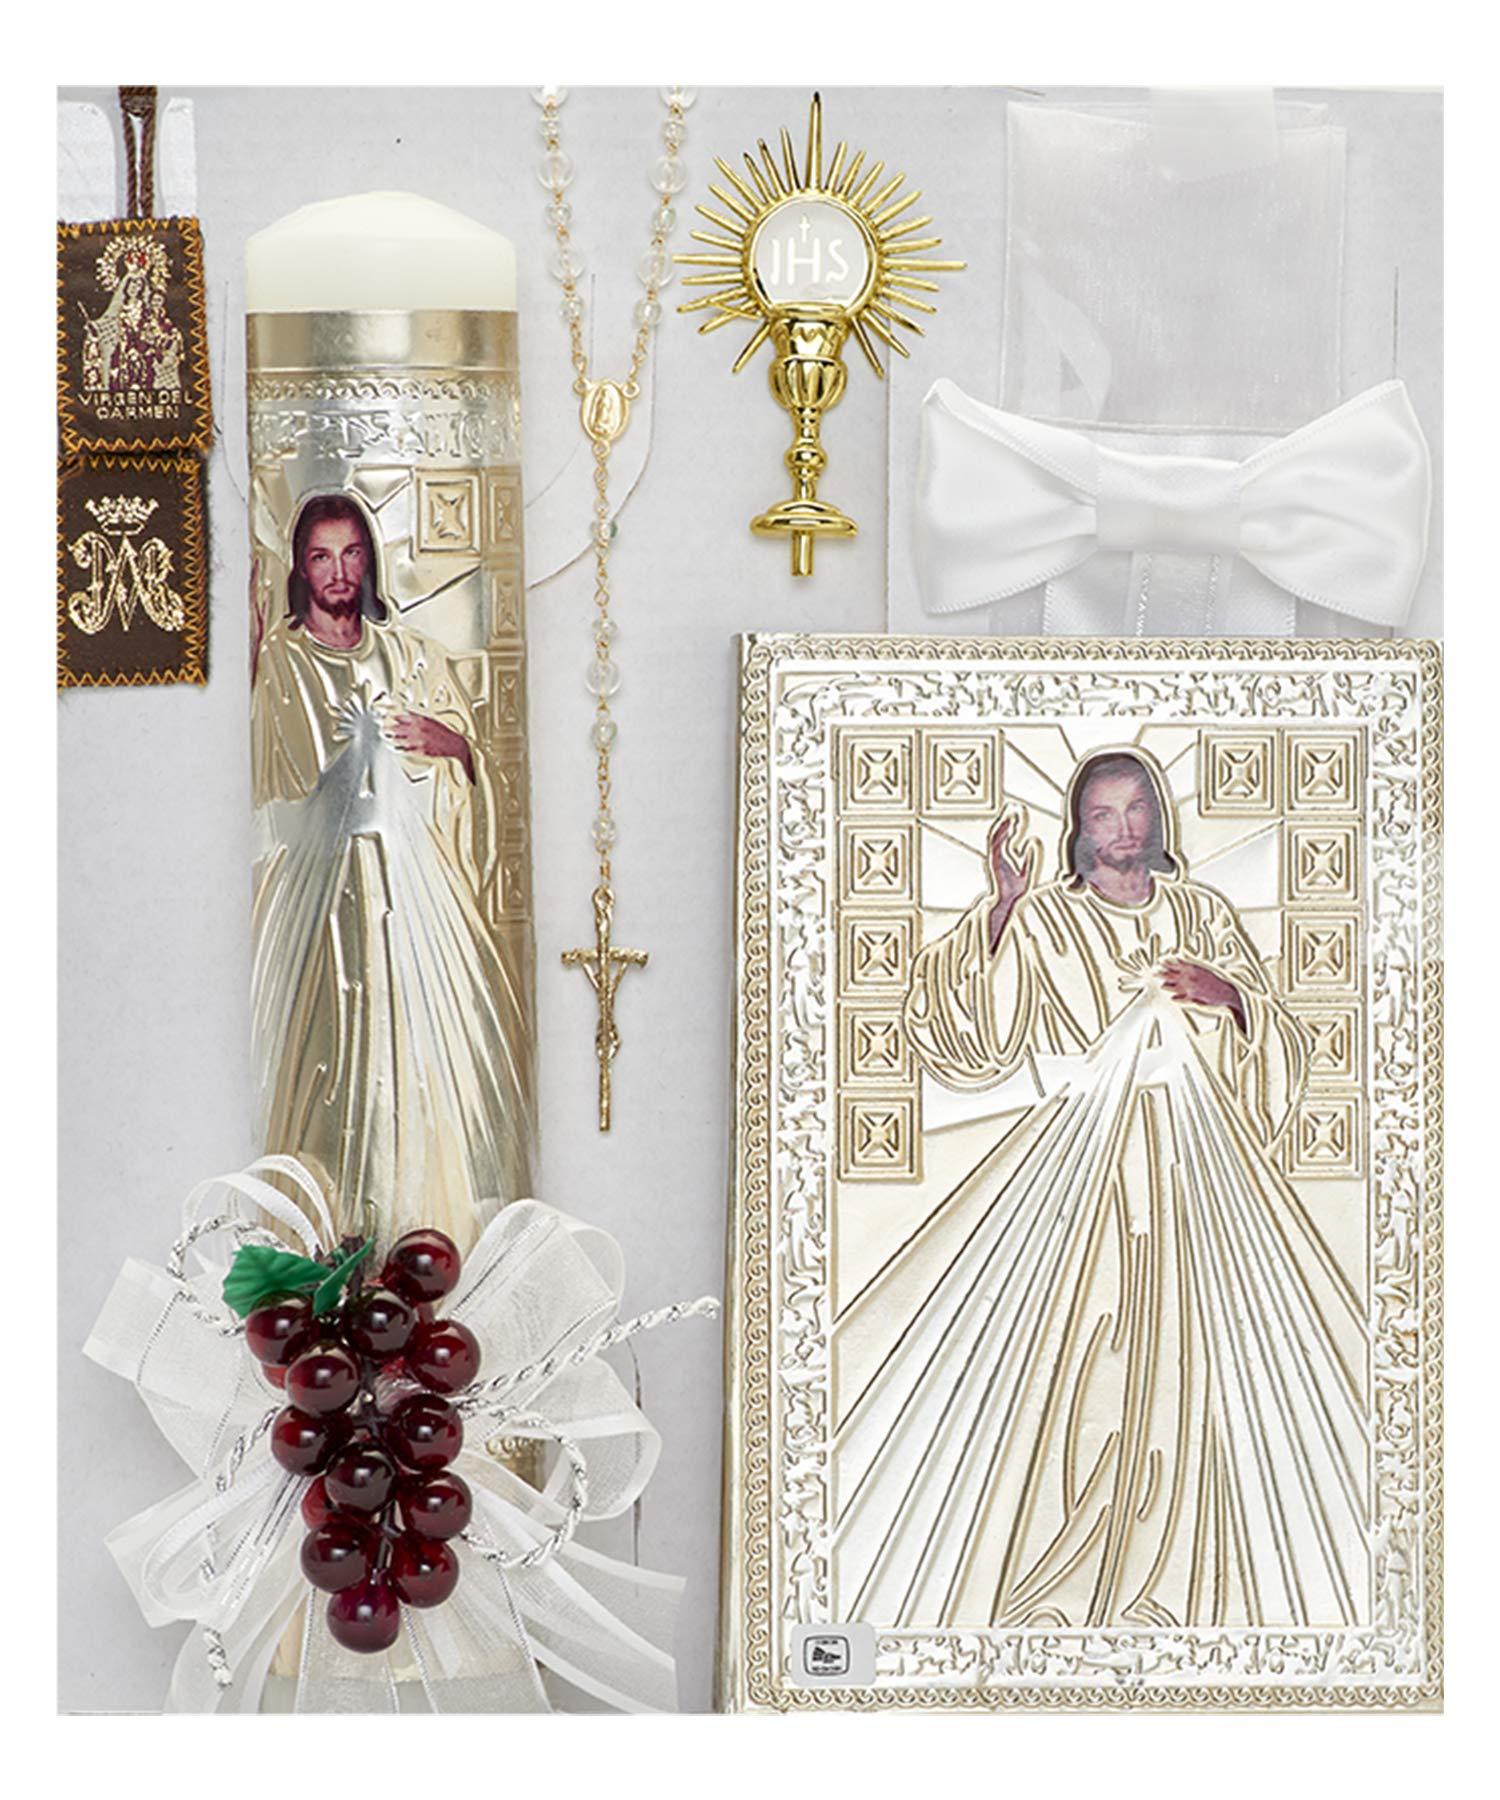 Cocochildren.com Mx-451C Mercy First Communion Candle Set